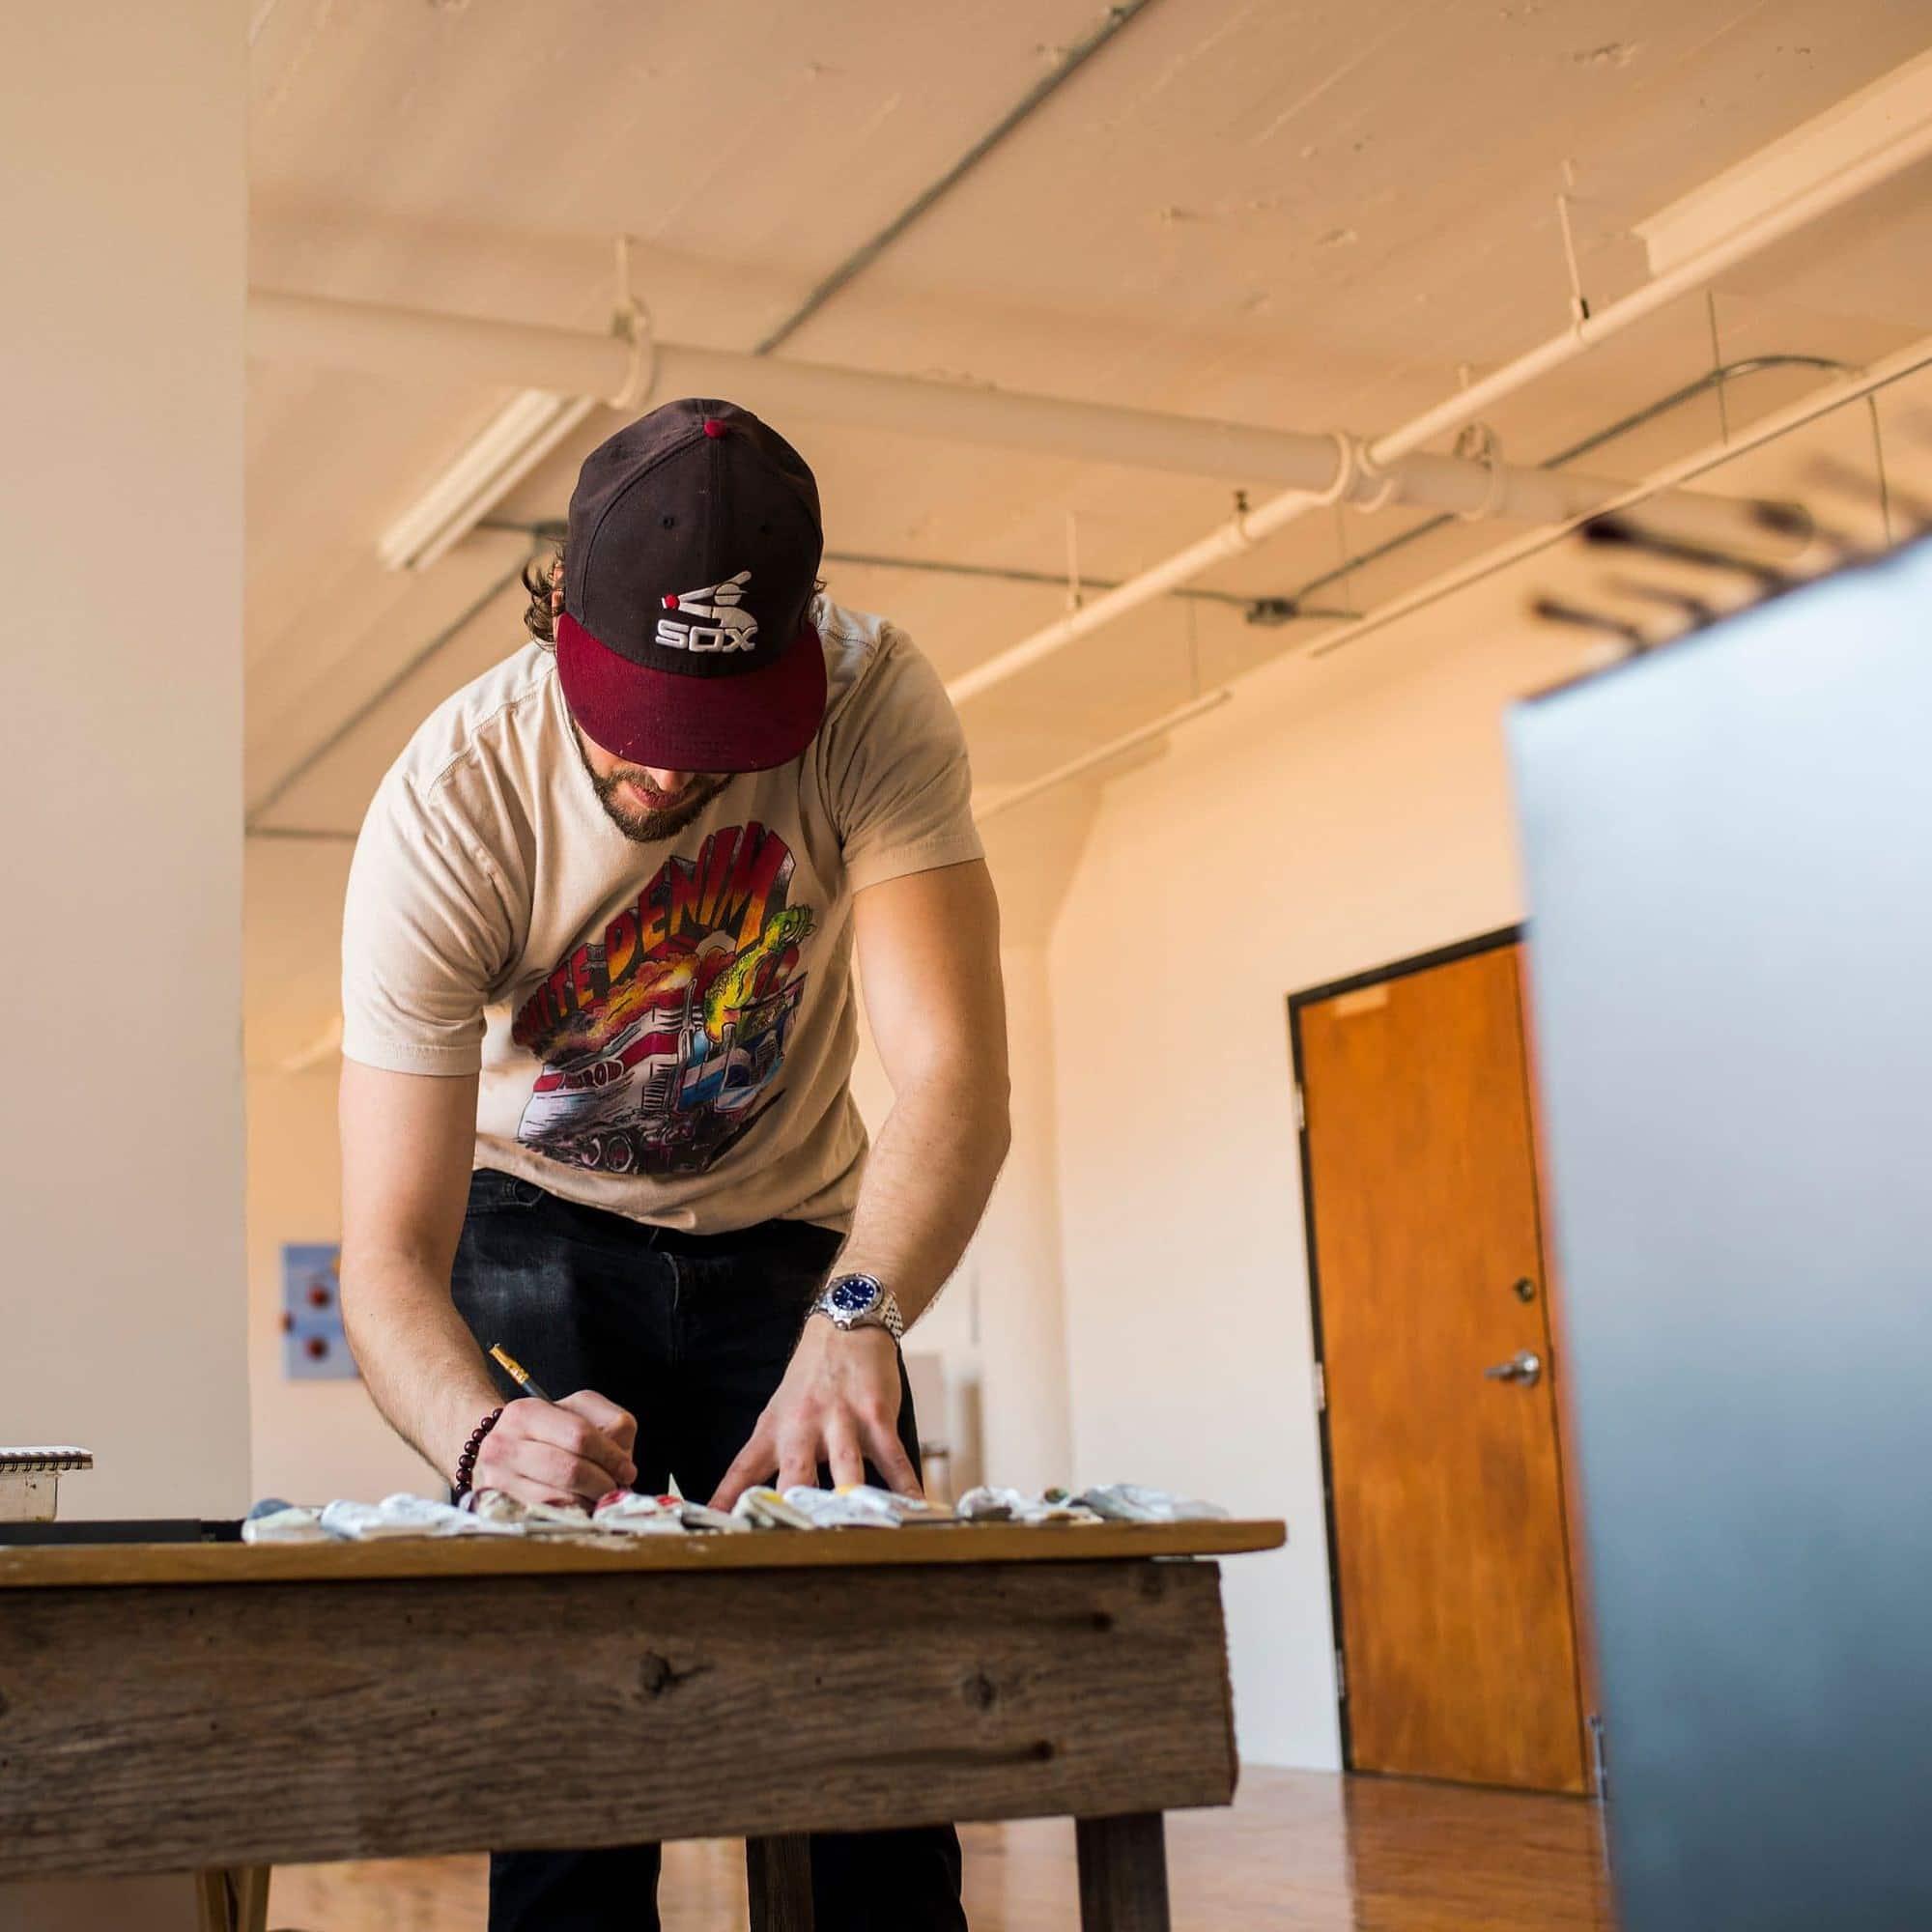 Minneapolis branding photographer for local artisans